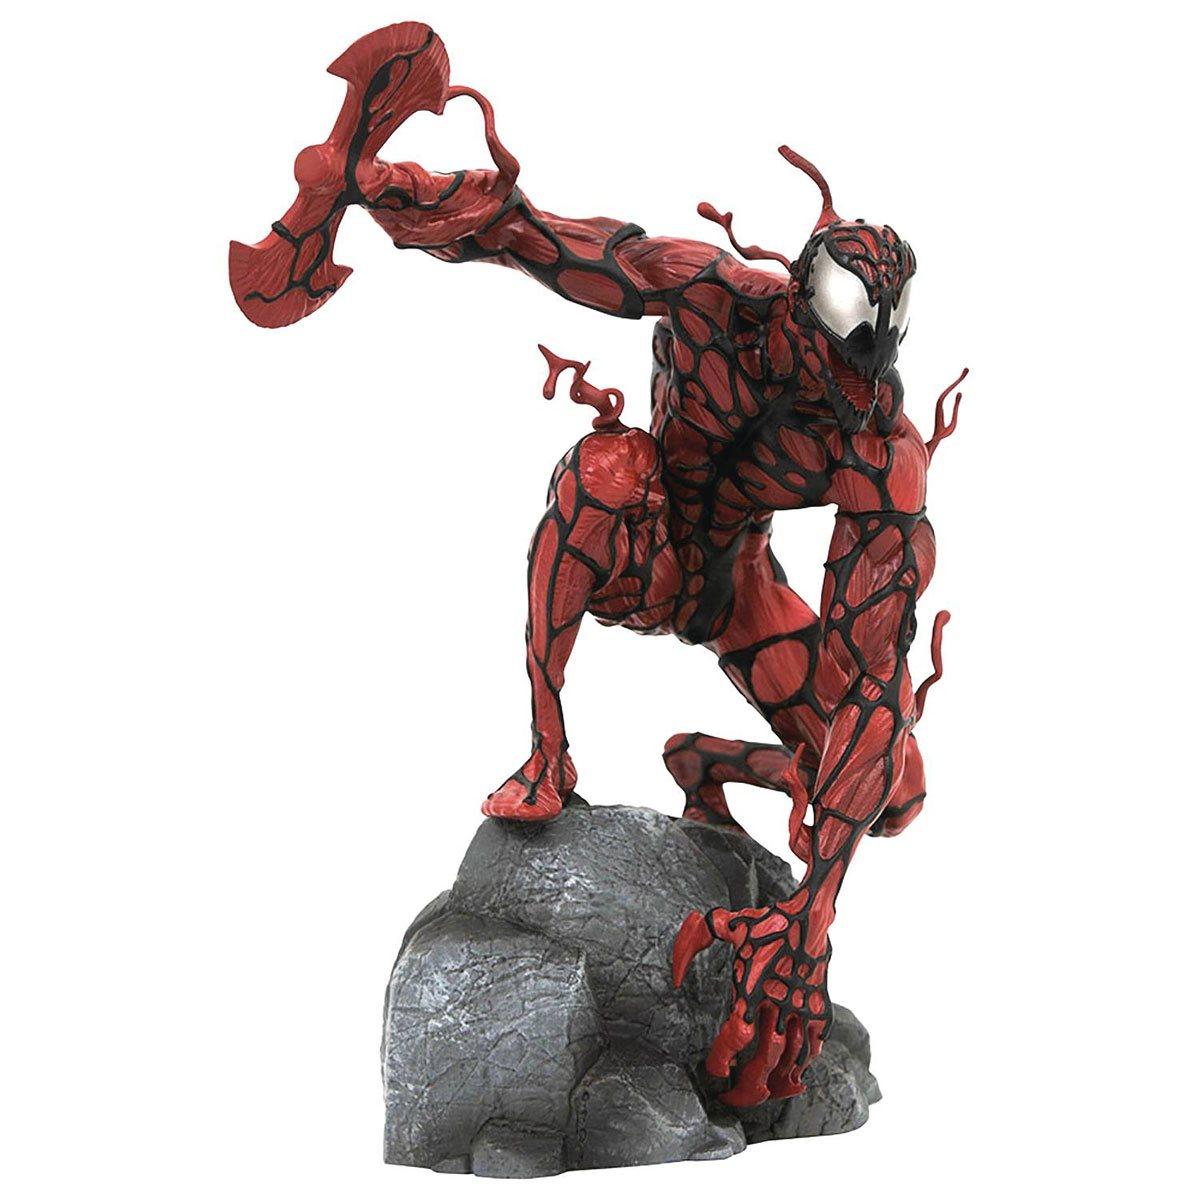 Halloween 2020 Carnage Marvel Gallery Glow in the Dark Carnage Statue   Halloween